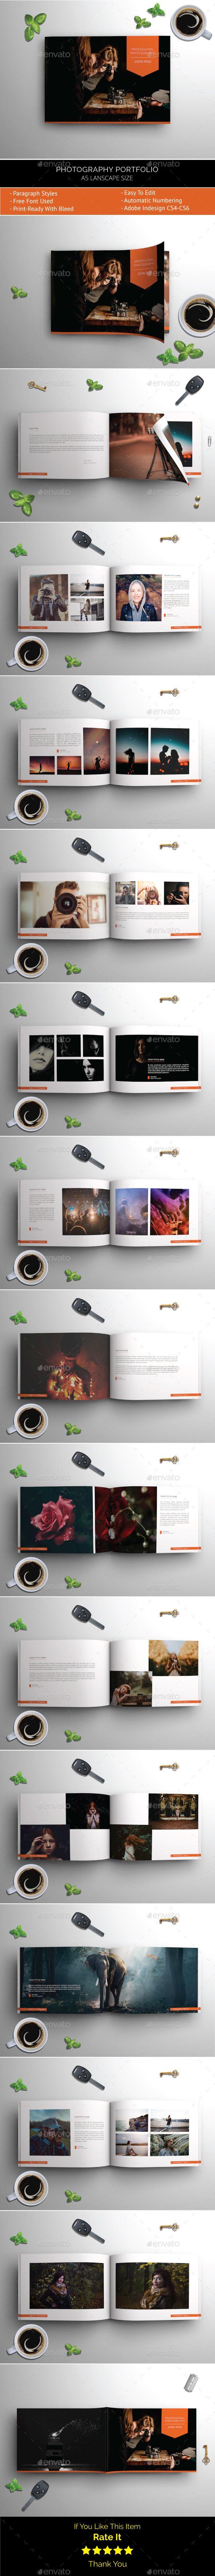 graphy Portfolio Albums Print Templates